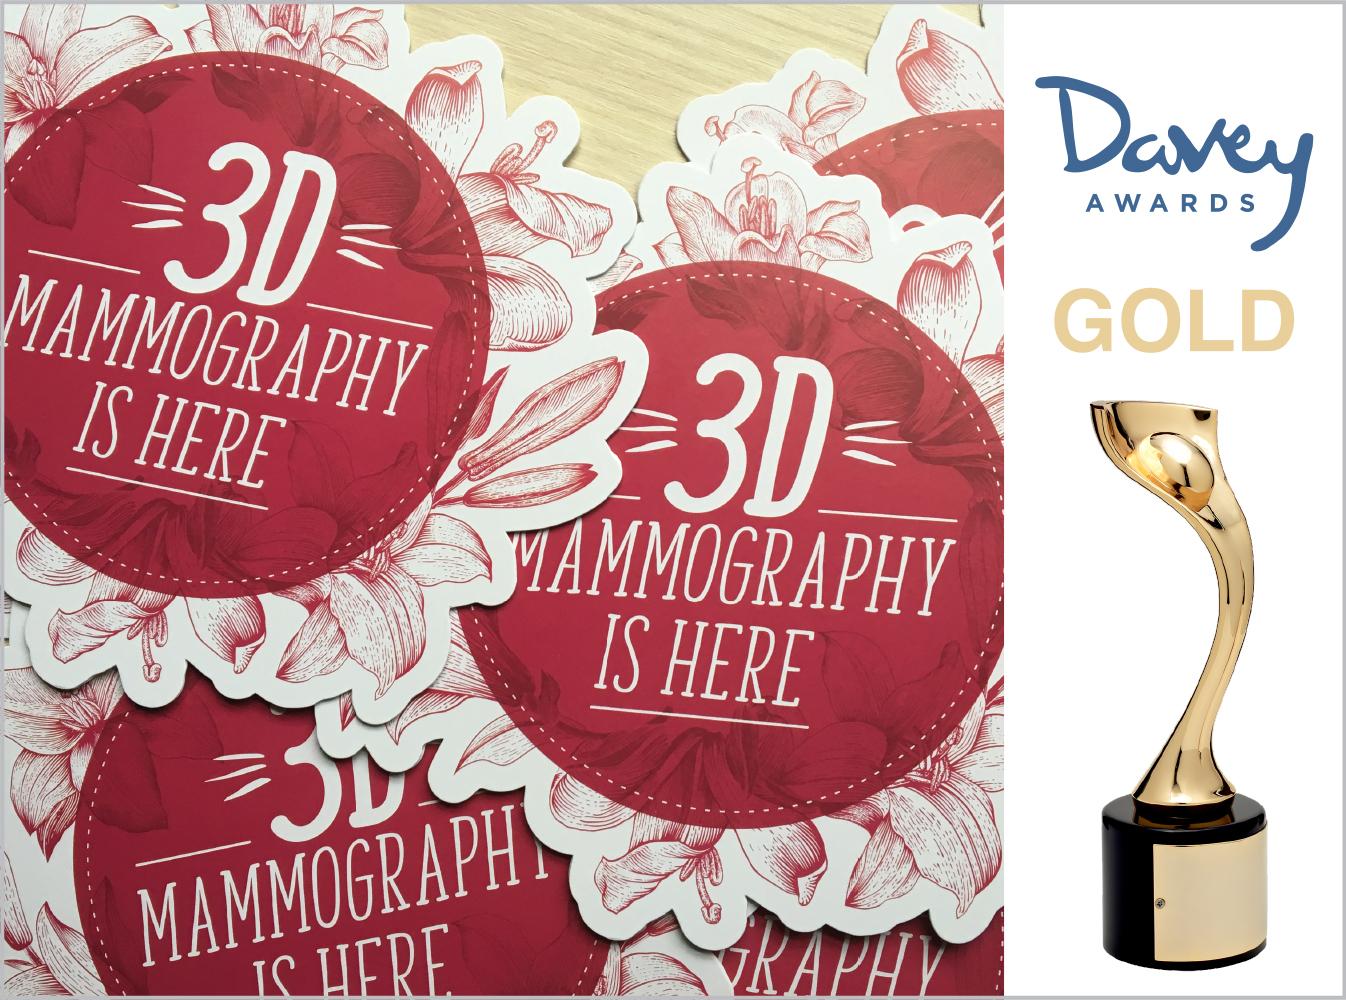 Women's Imaging of Radiology Associates of Tallahassee 3D Mammogram Brochure